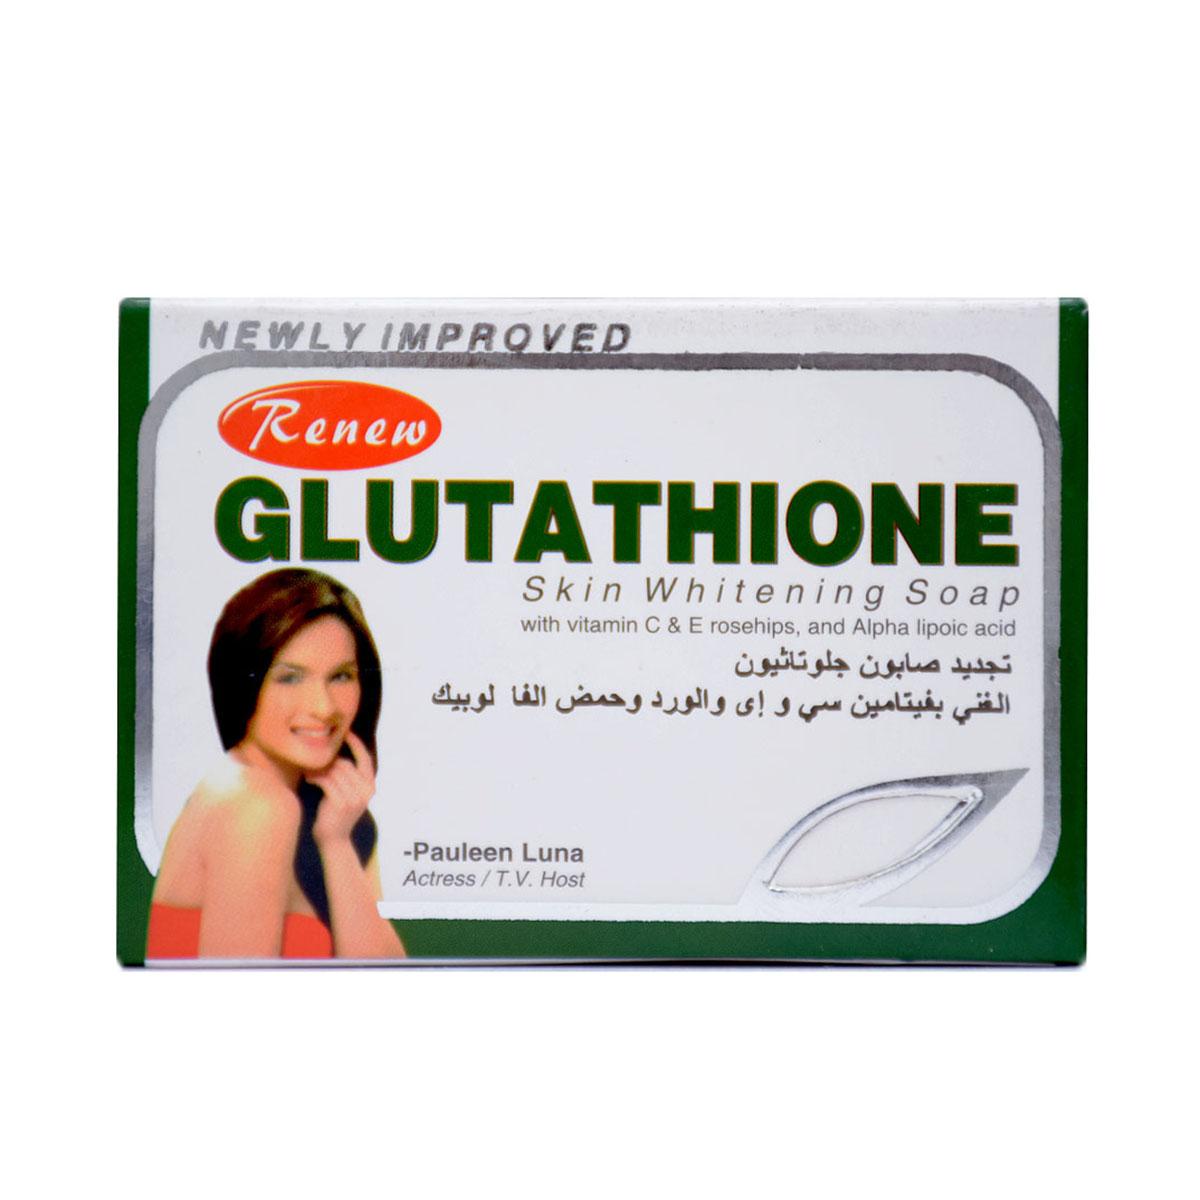 beautystore2016 Renew Glutathione Soap For Skin Brightening 135g